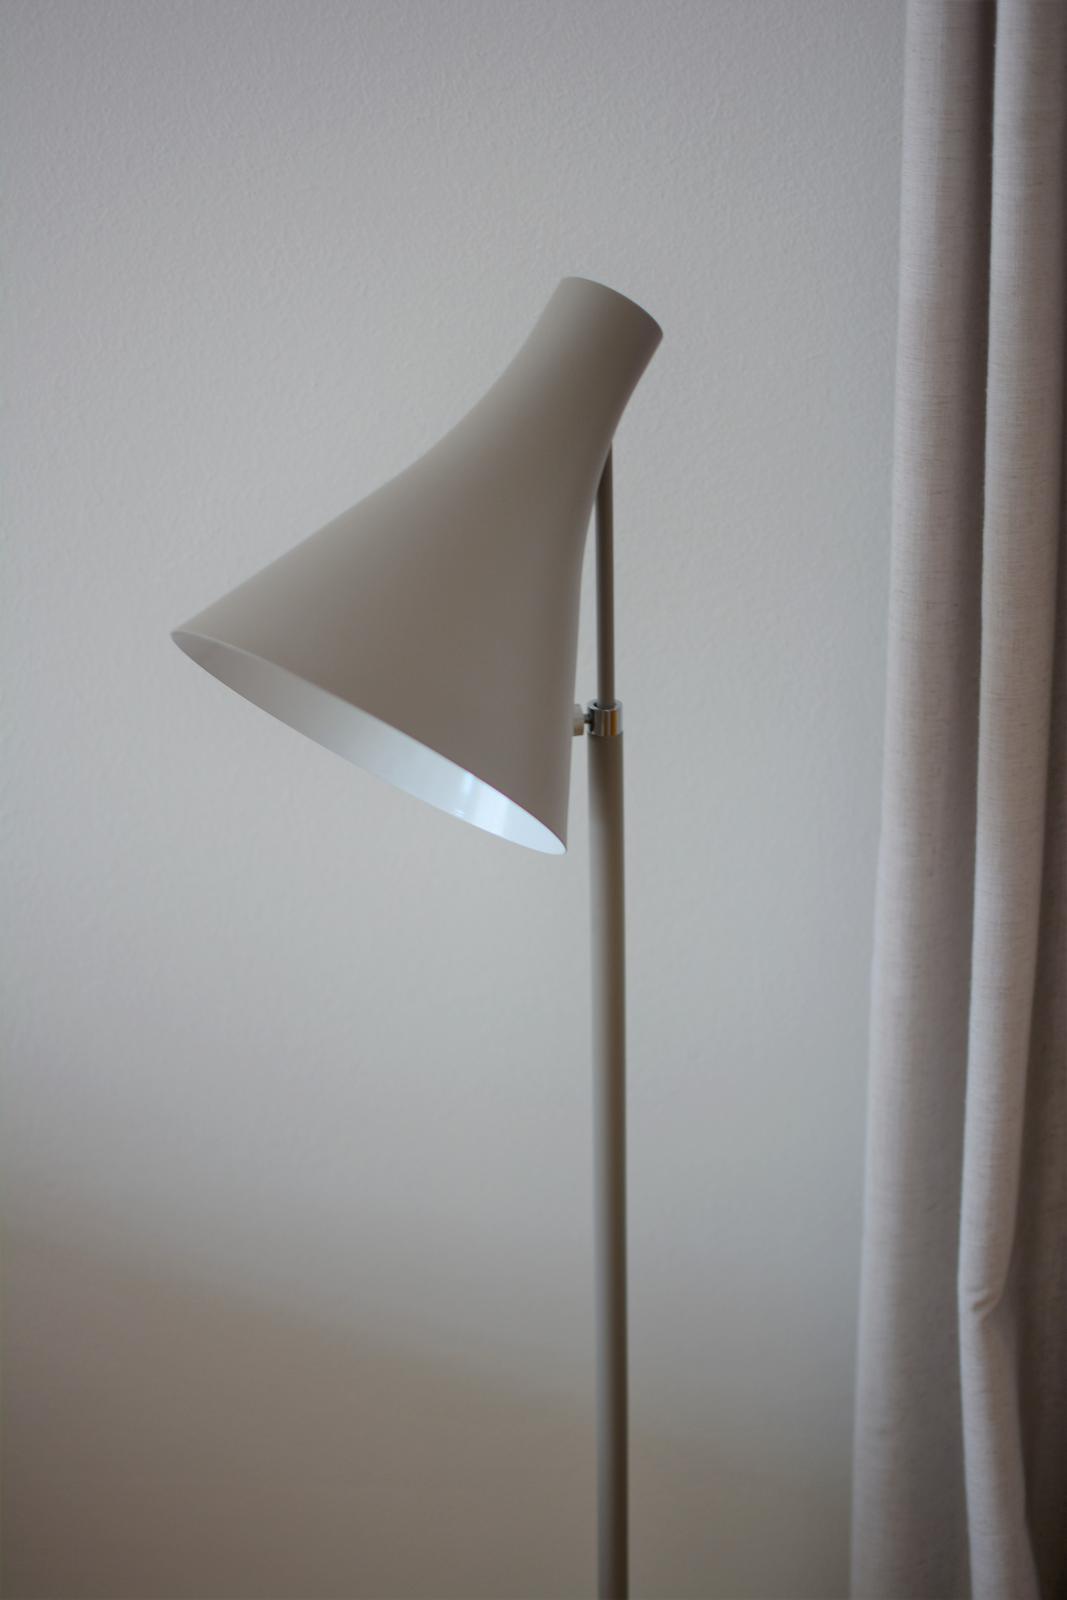 Stojacie svietidlo Phillips, nepoužívané - Obrázok č. 1